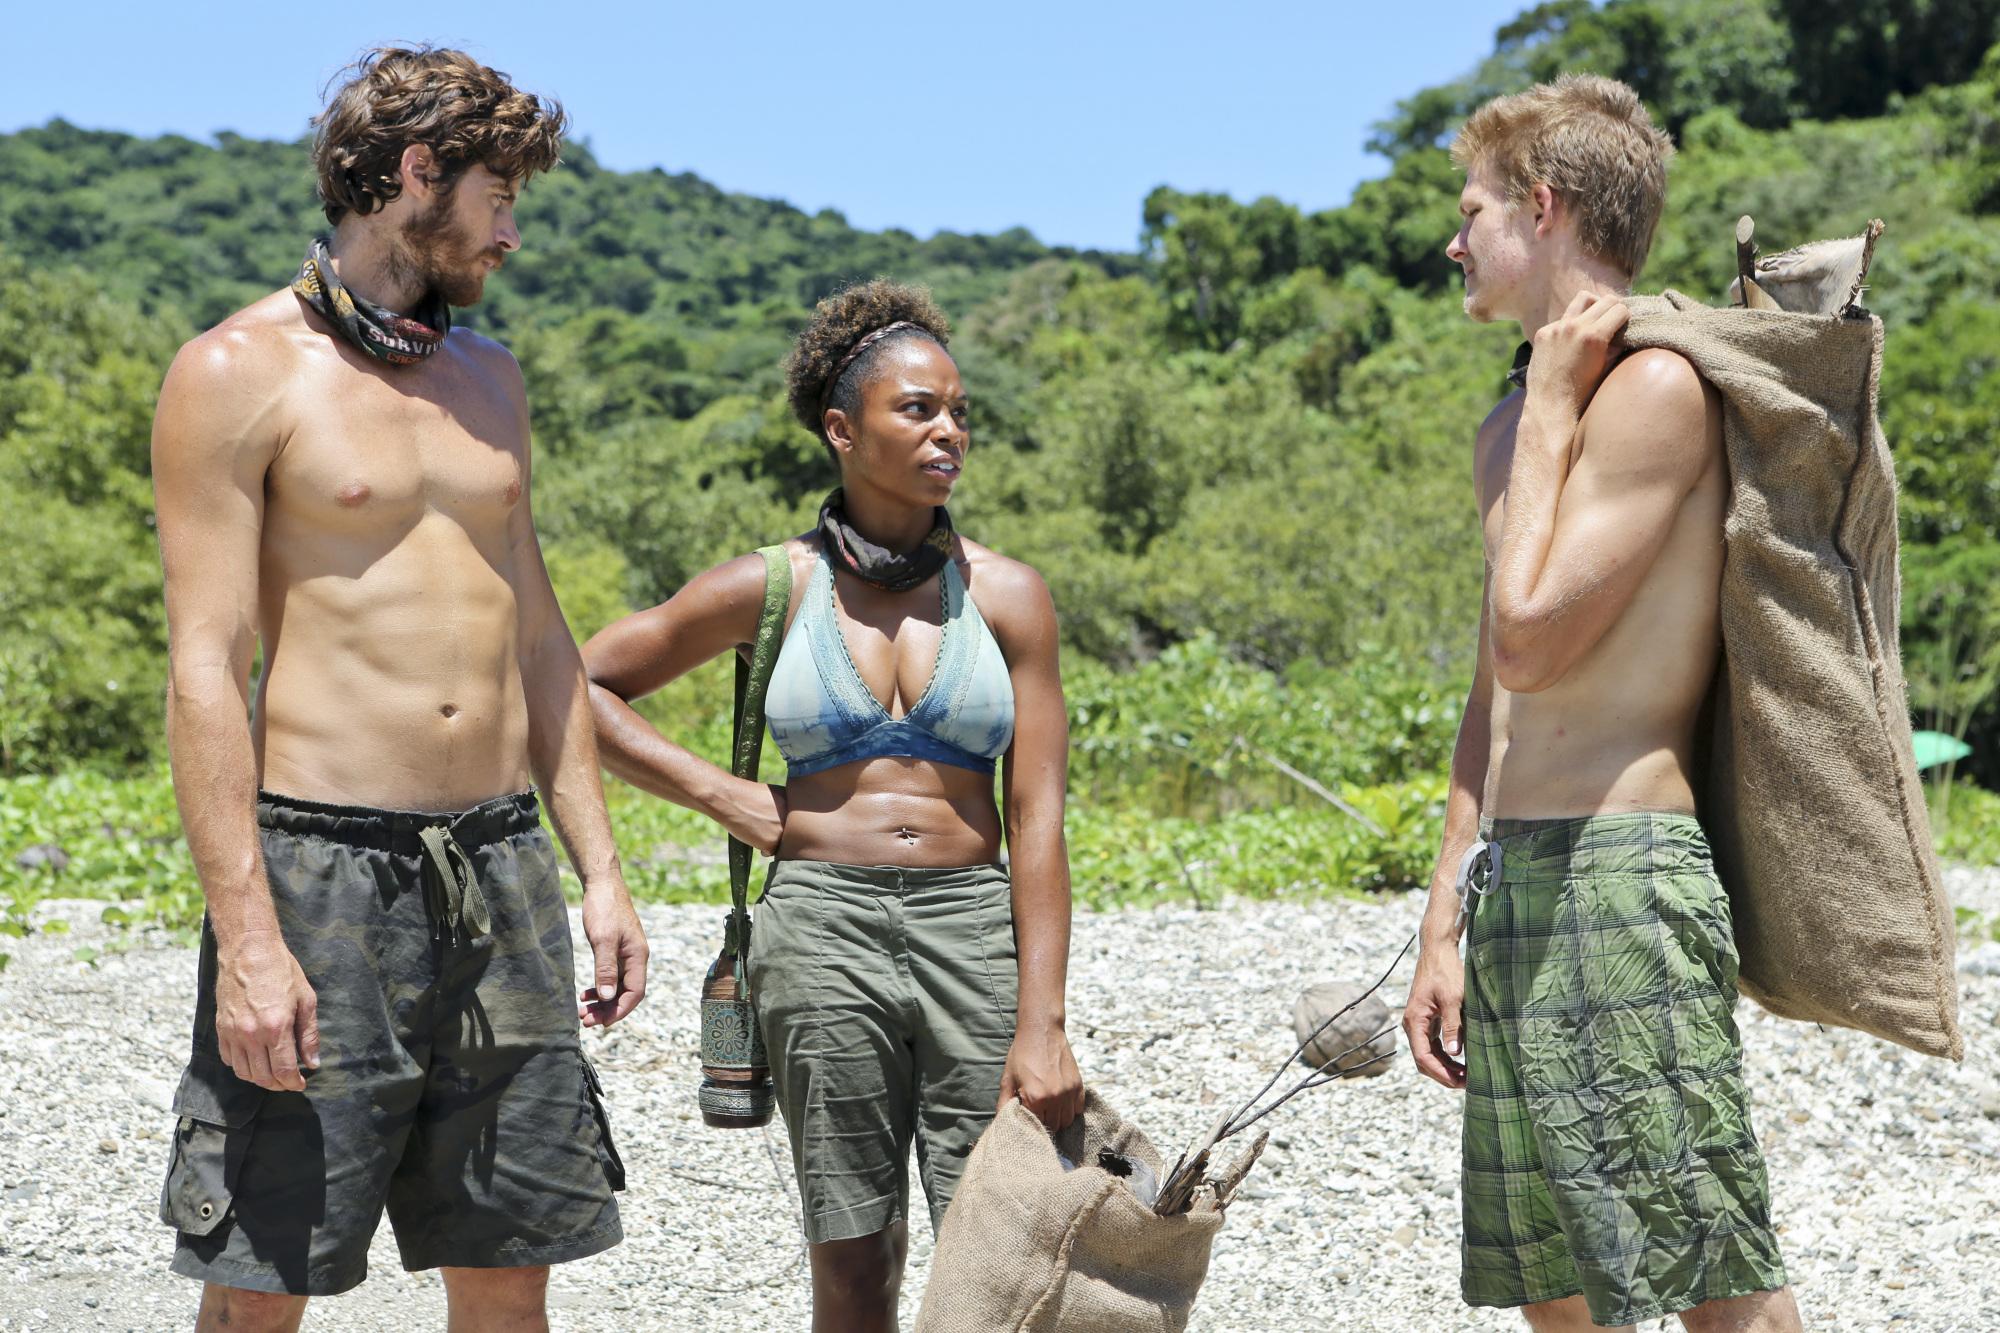 Alliance discussion in Season 28 Episode 9